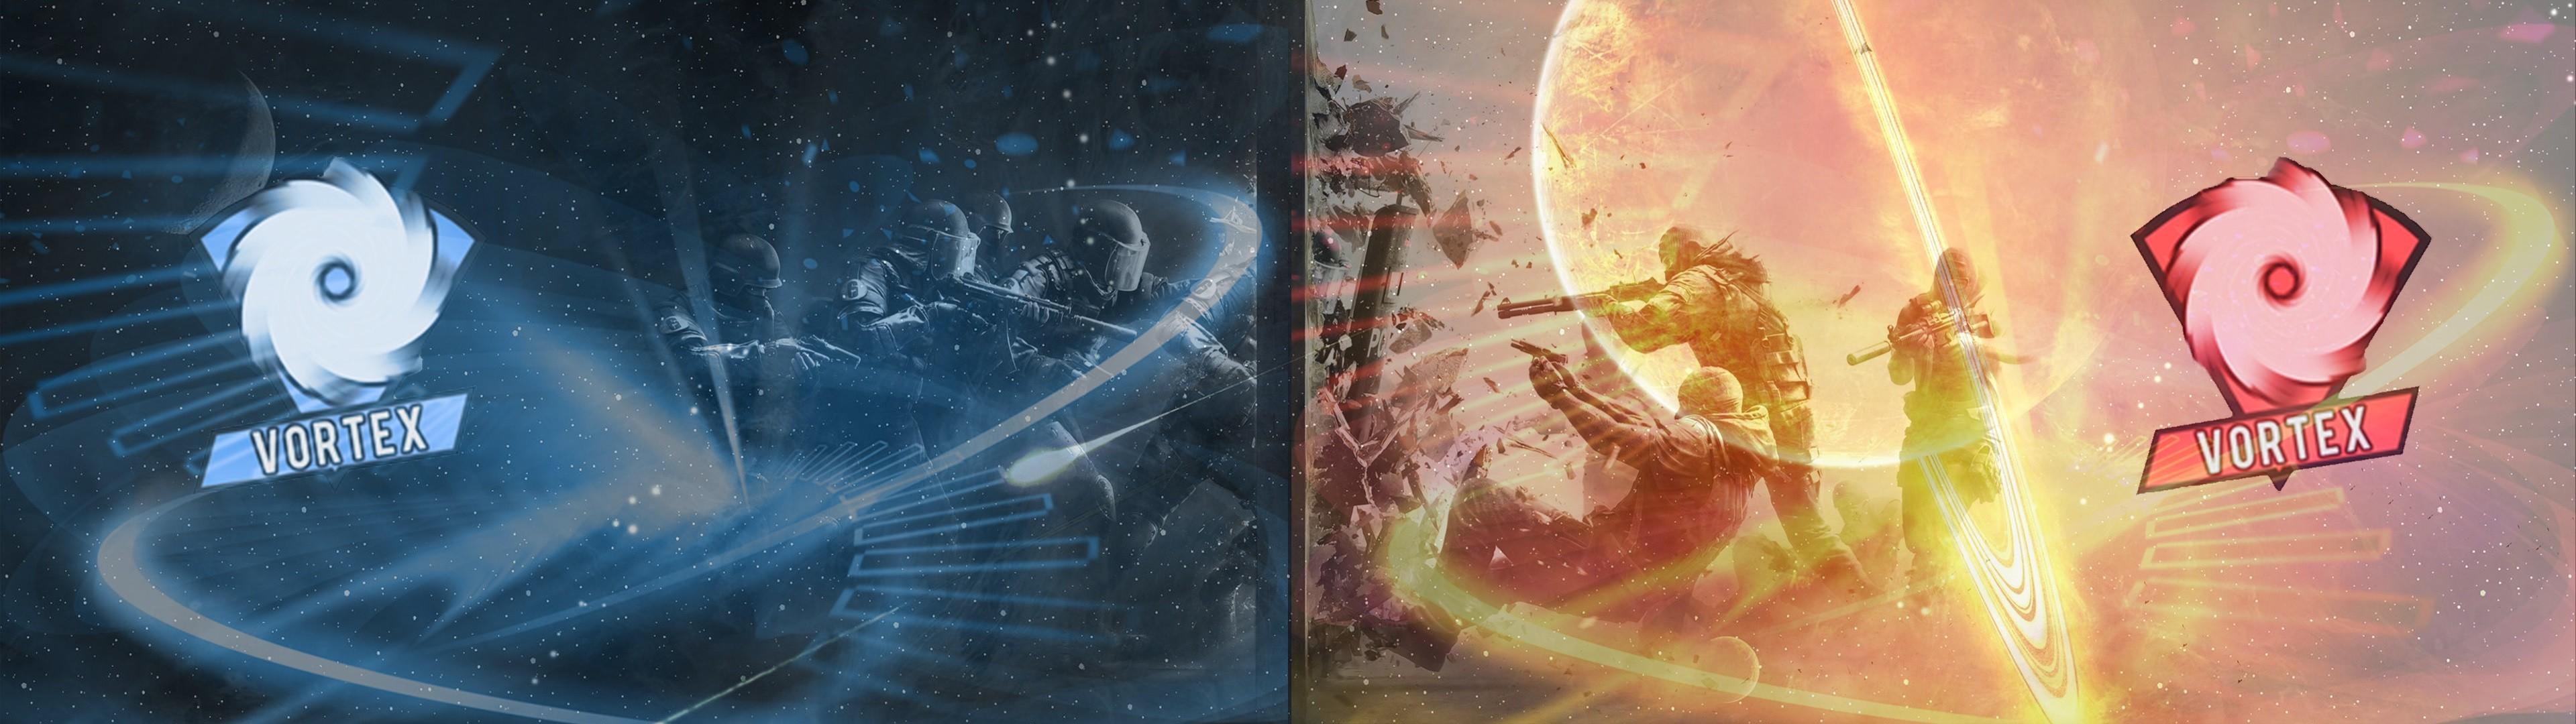 … Team Vortex CSGO (Dual Screen Wallpaper) by MrElderon